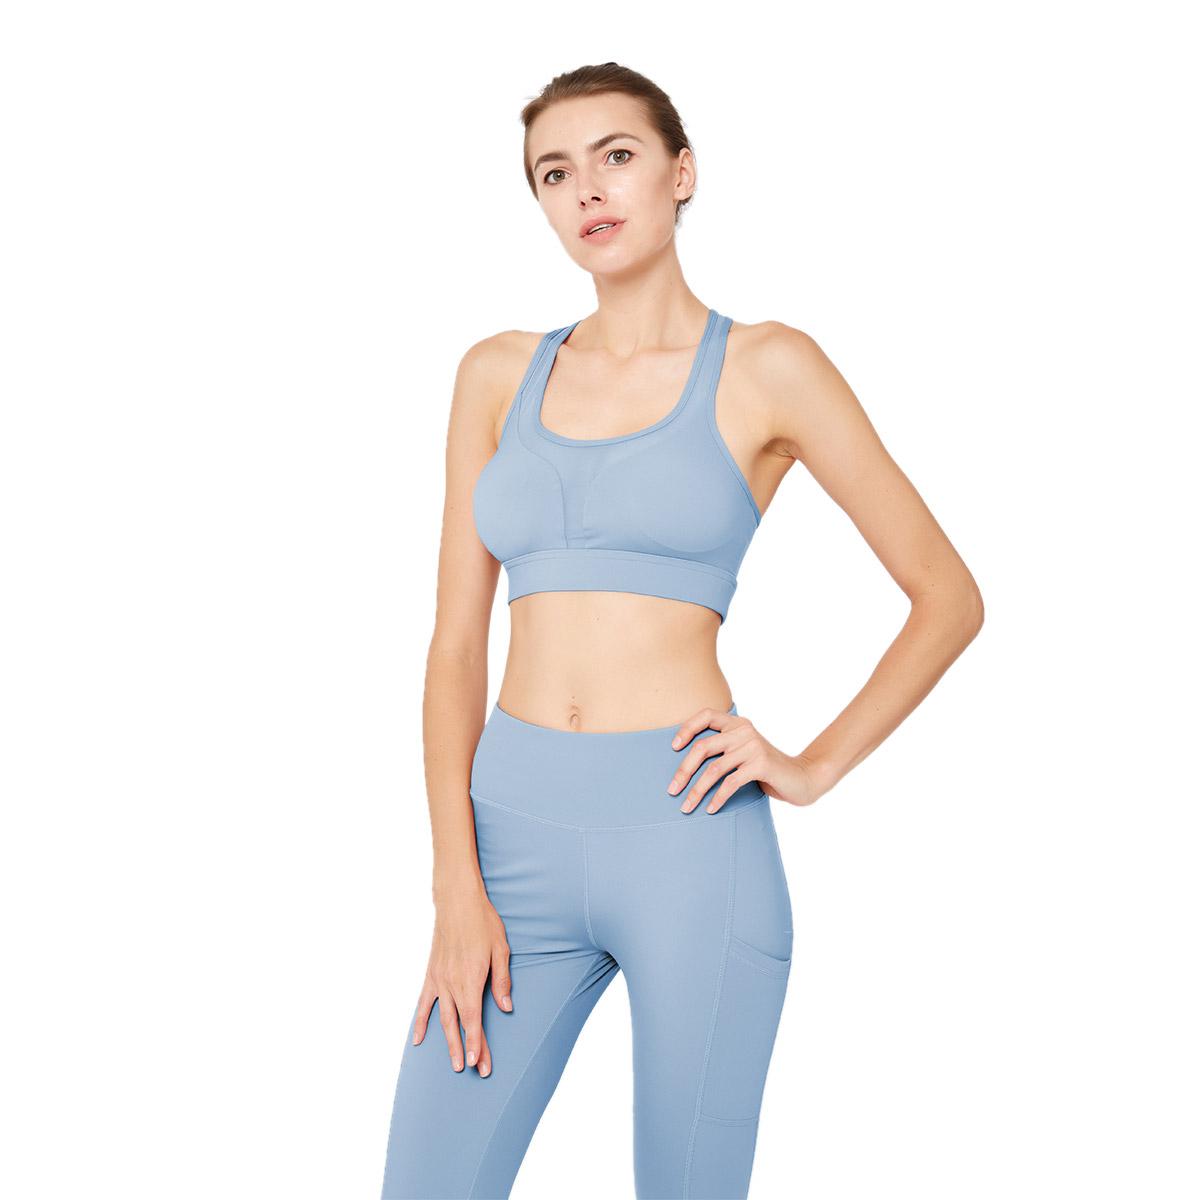 ESERKAFEL 100% quality cross back sports bra trader-1